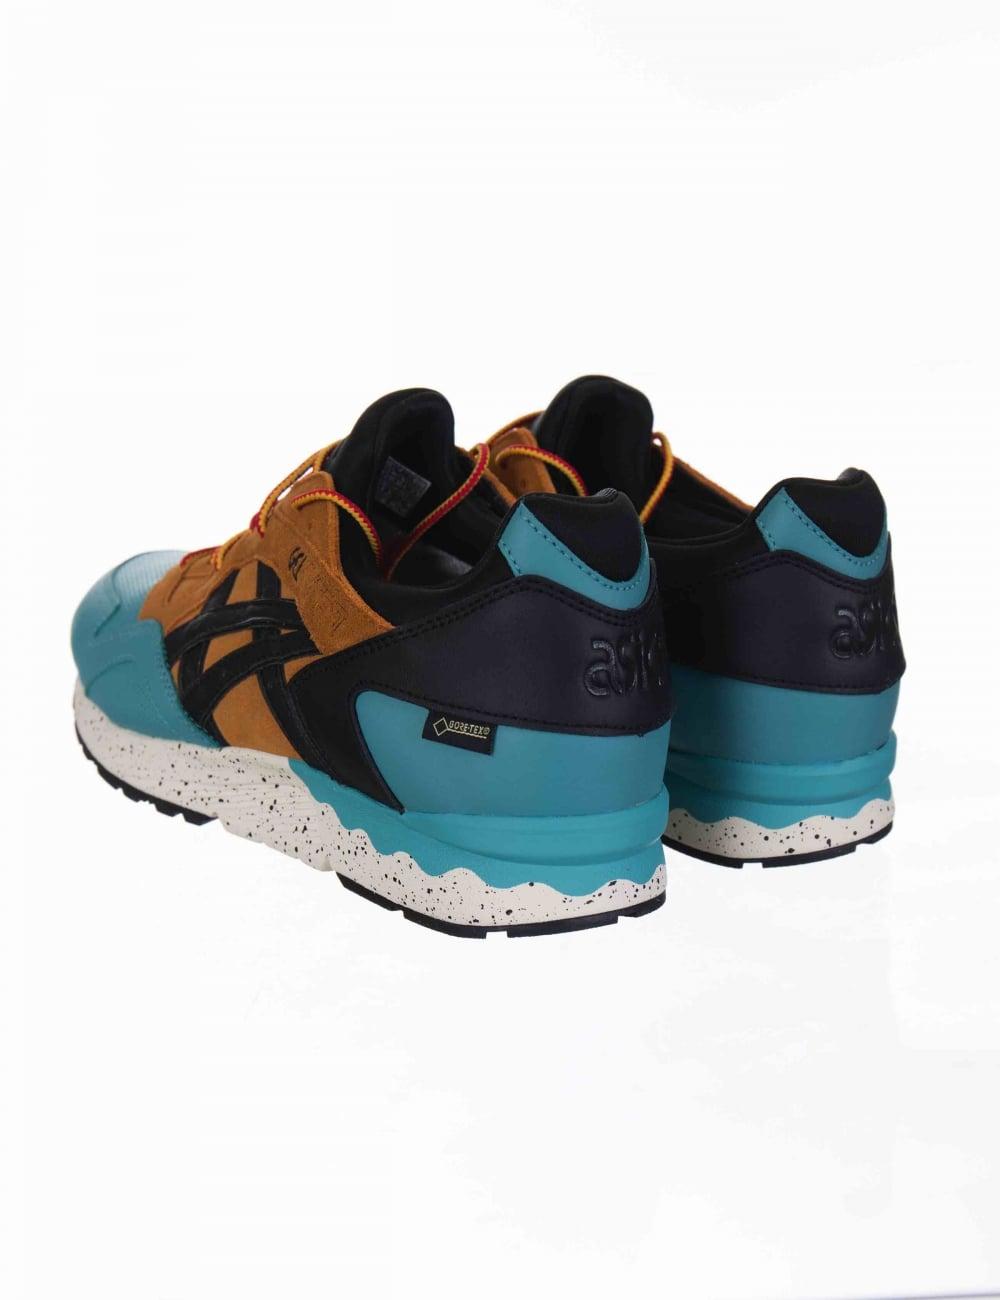 Asics Gel Lyte V Gore-Tex Shoes